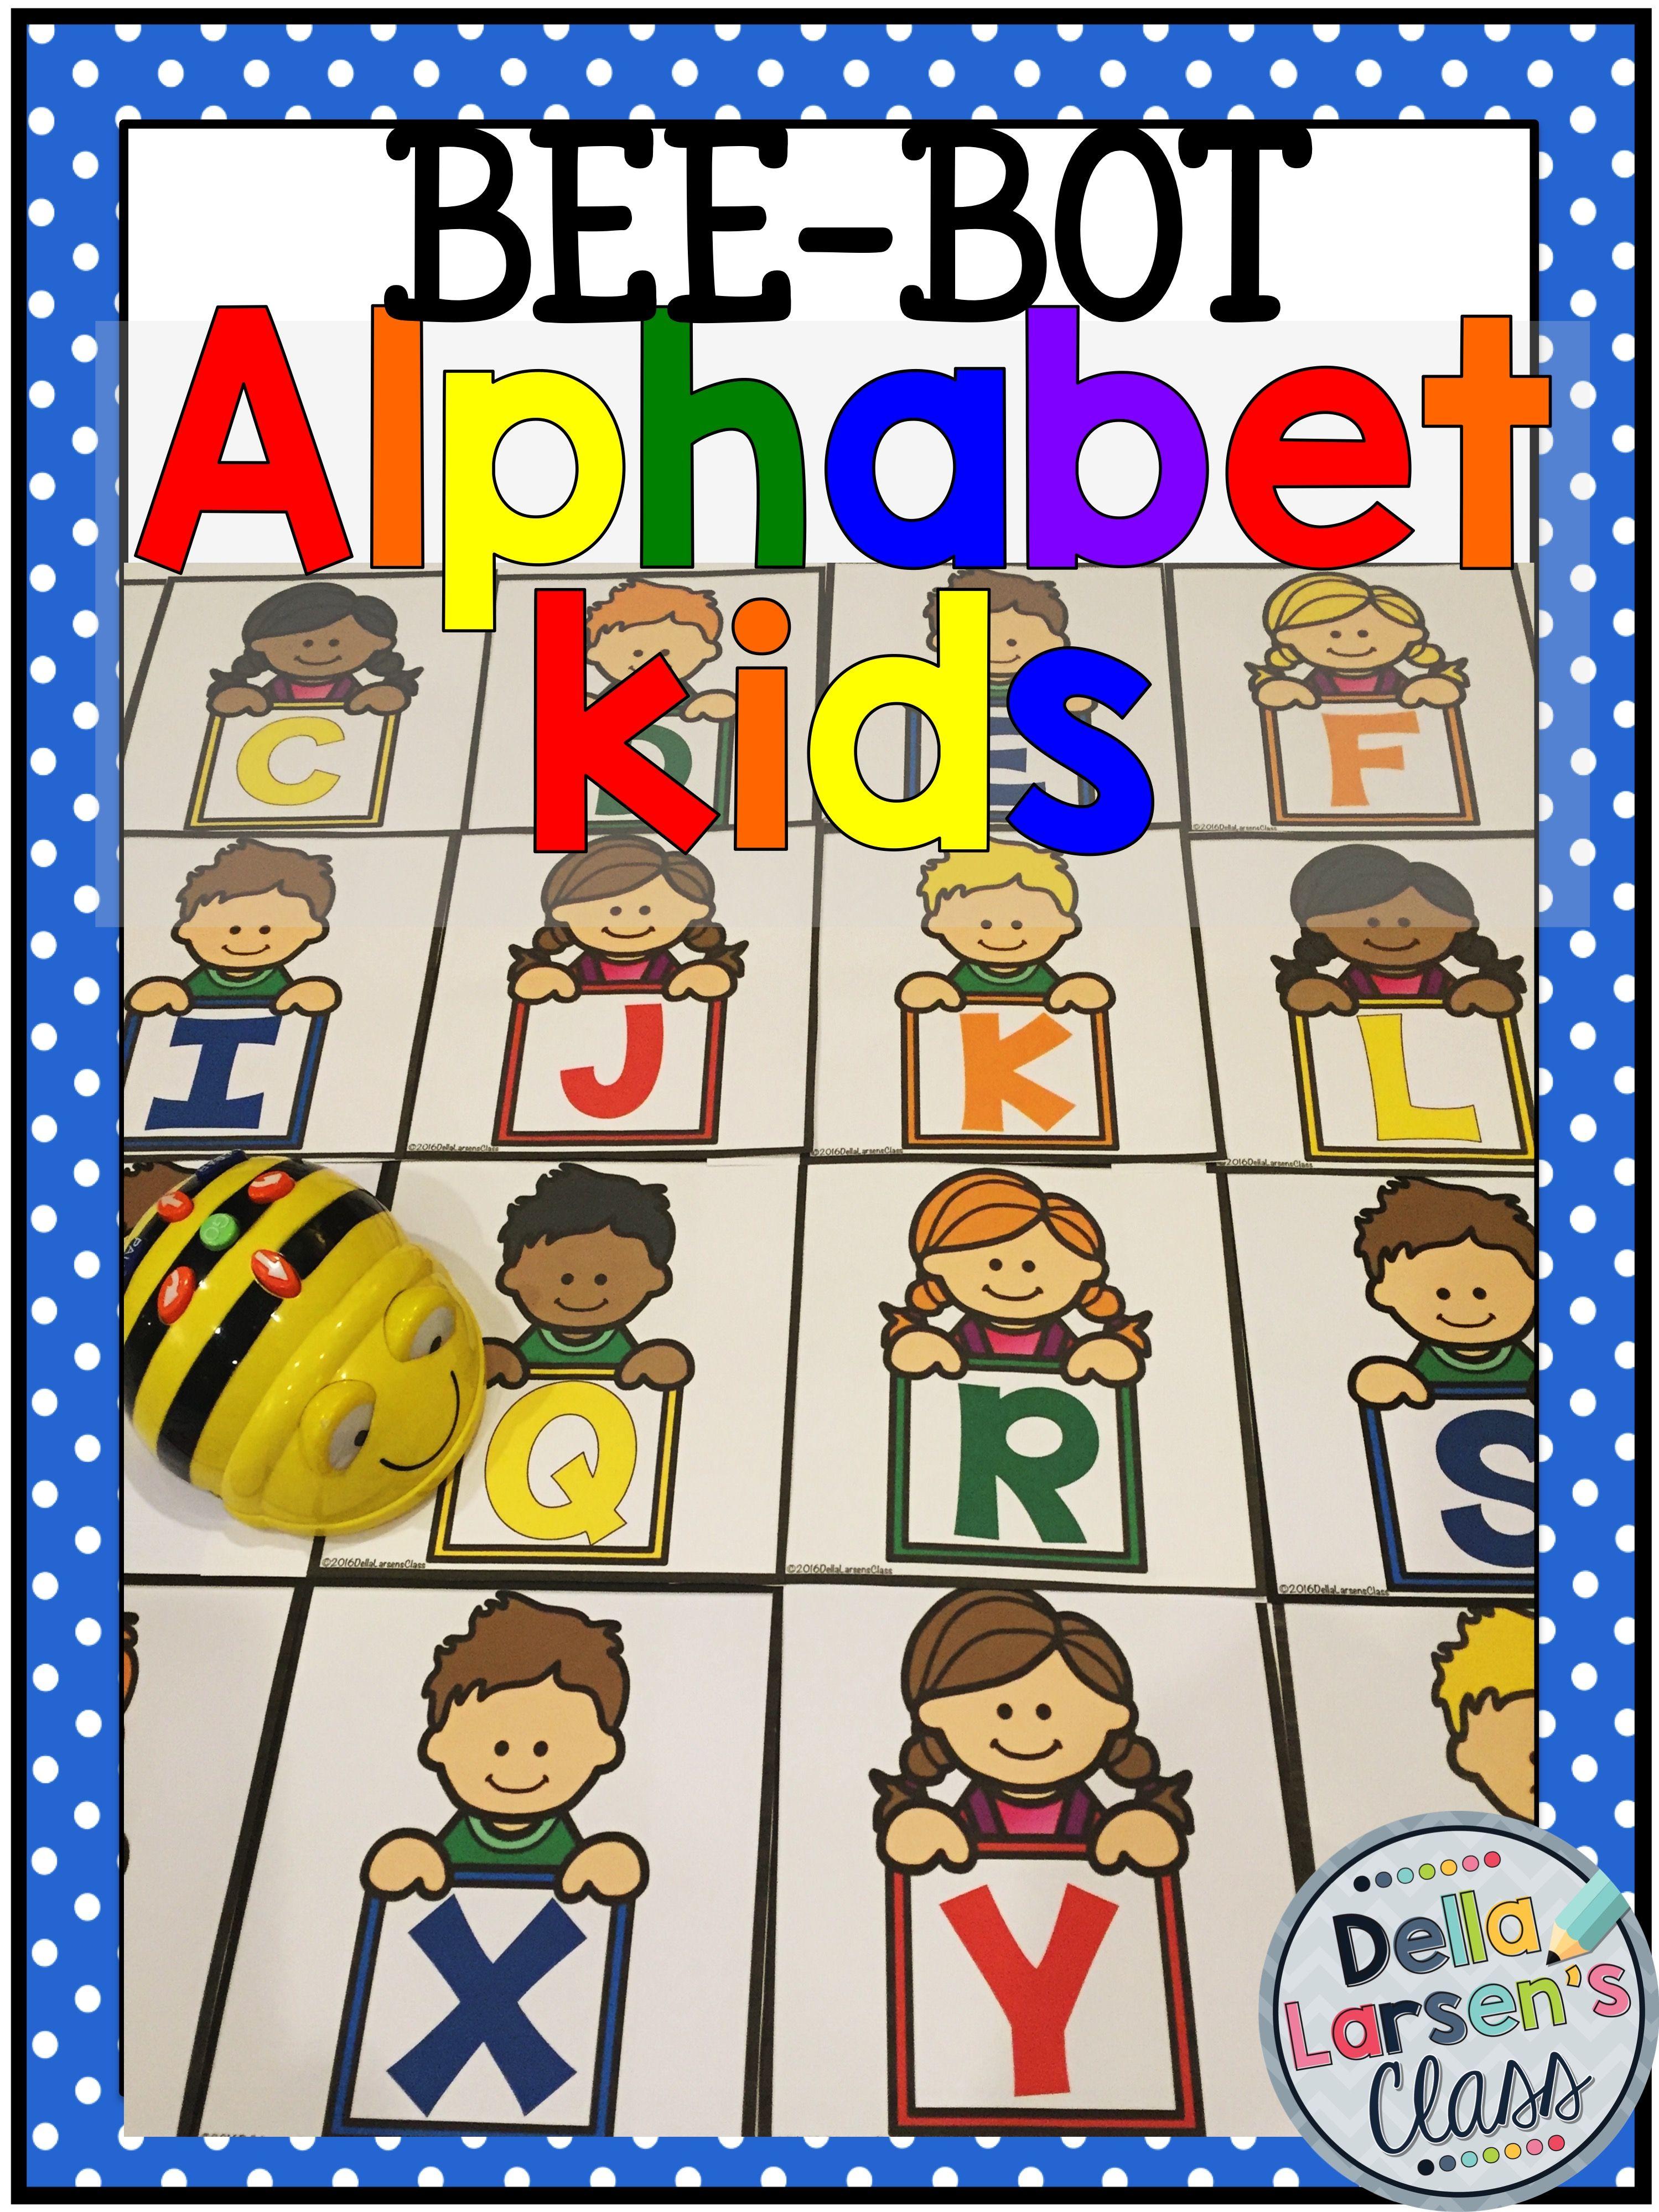 Bee Bot Alphabet Kids